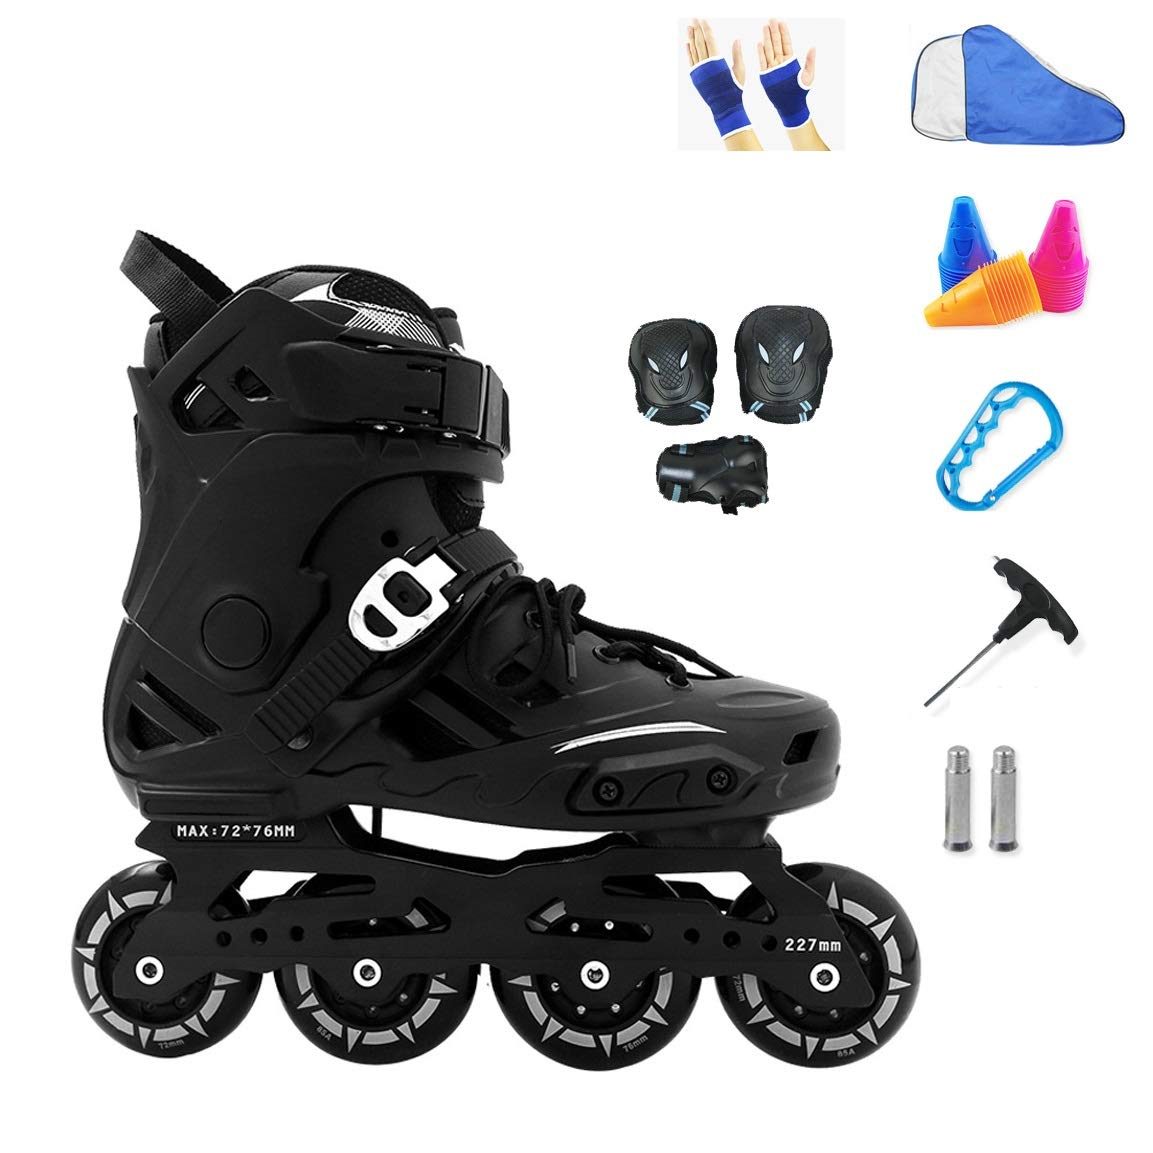 YANGXIAOYU Inline Skates, Fixed Nut Buckle Design Inline Skates Set White Black Suitable for Men and Women Boys Girls (Color : Black, Size : 38 EU/6 US/5 UK/24cm JP)